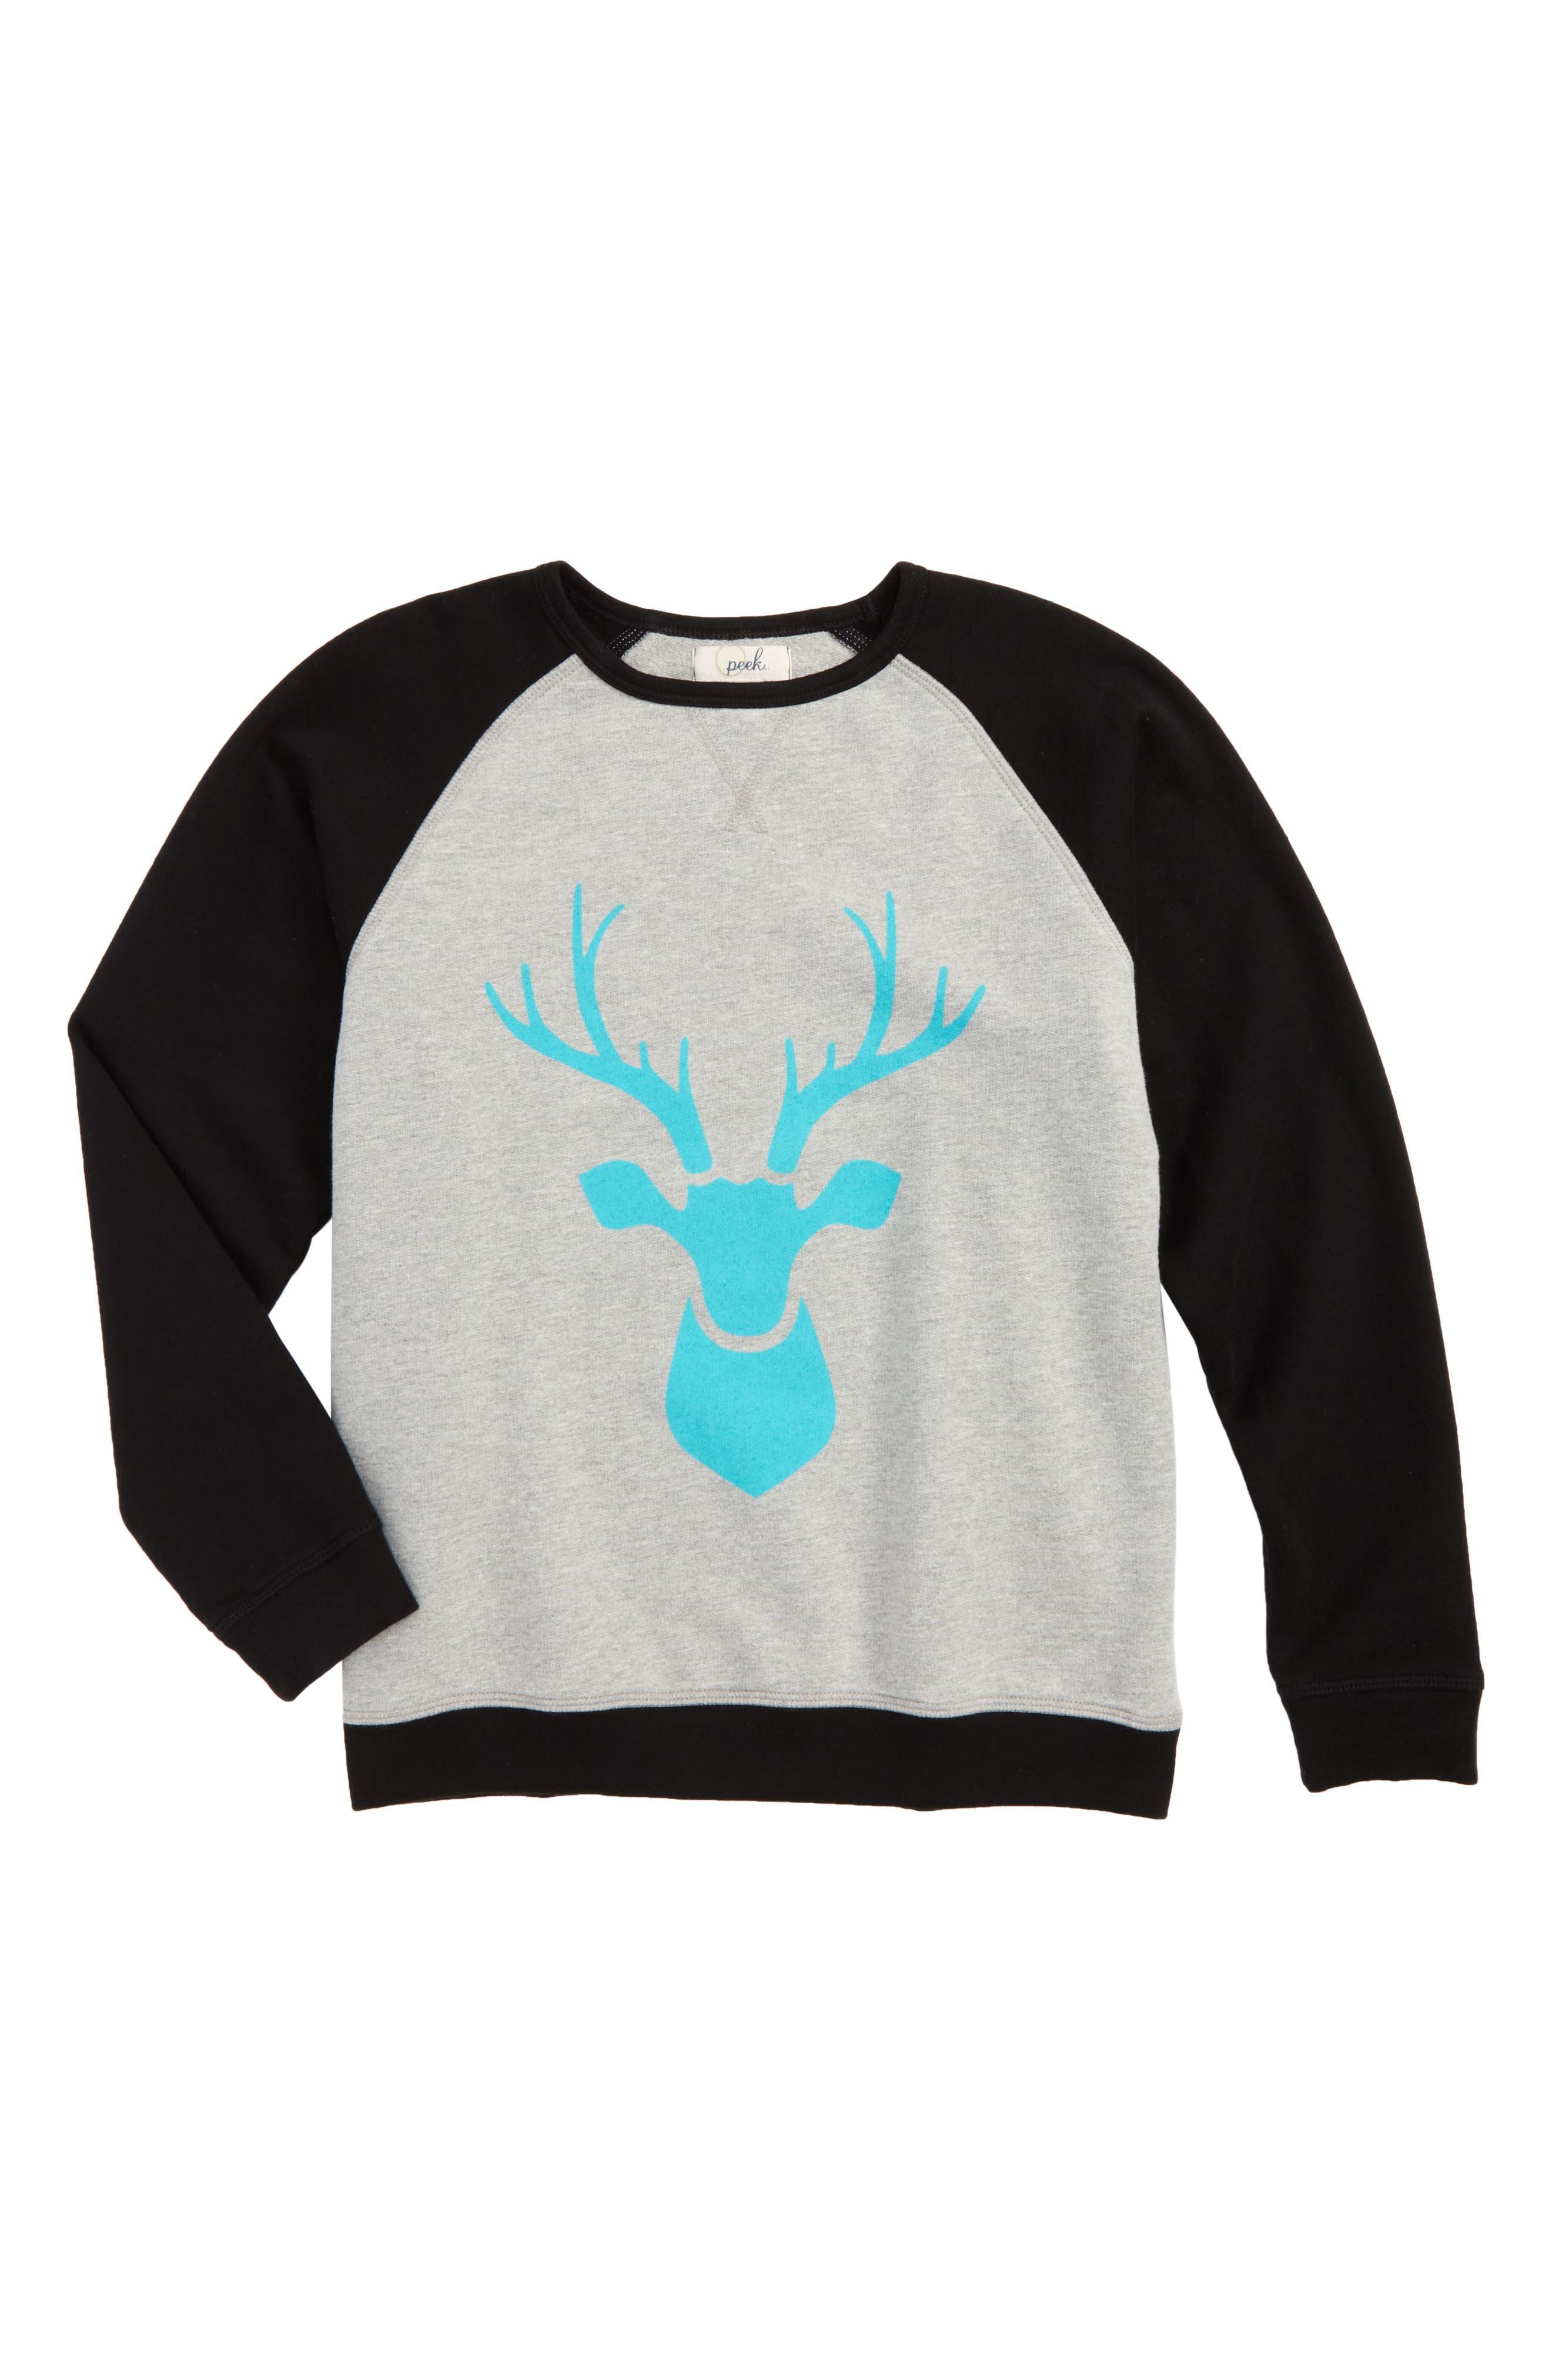 Alternate Image 1 Selected - Peek Reindeer Graphic Raglan Sweatshirt (Toddler Boys, Little Boys & Big Boys)